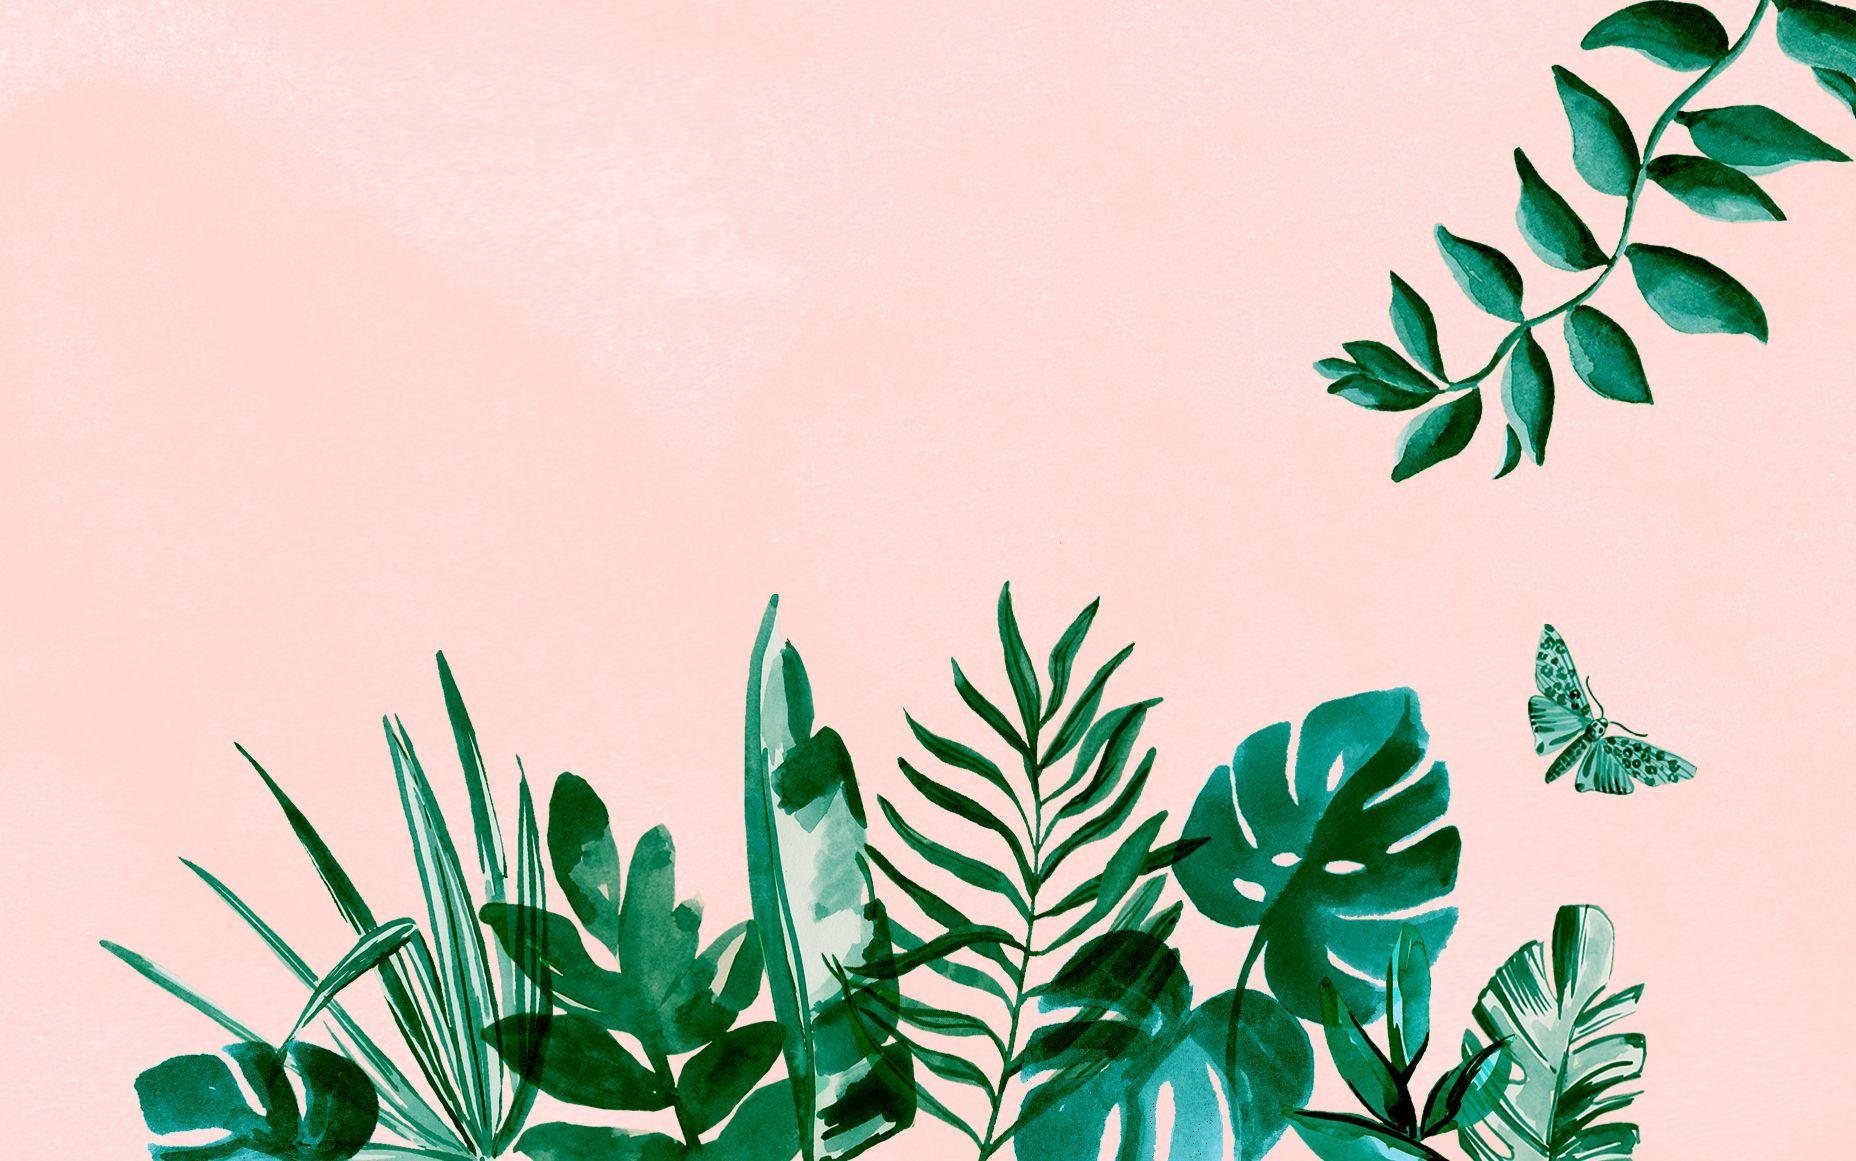 Plant Aesthetic Desktop Wallpapers   Top Plant Aesthetic 1856x1161